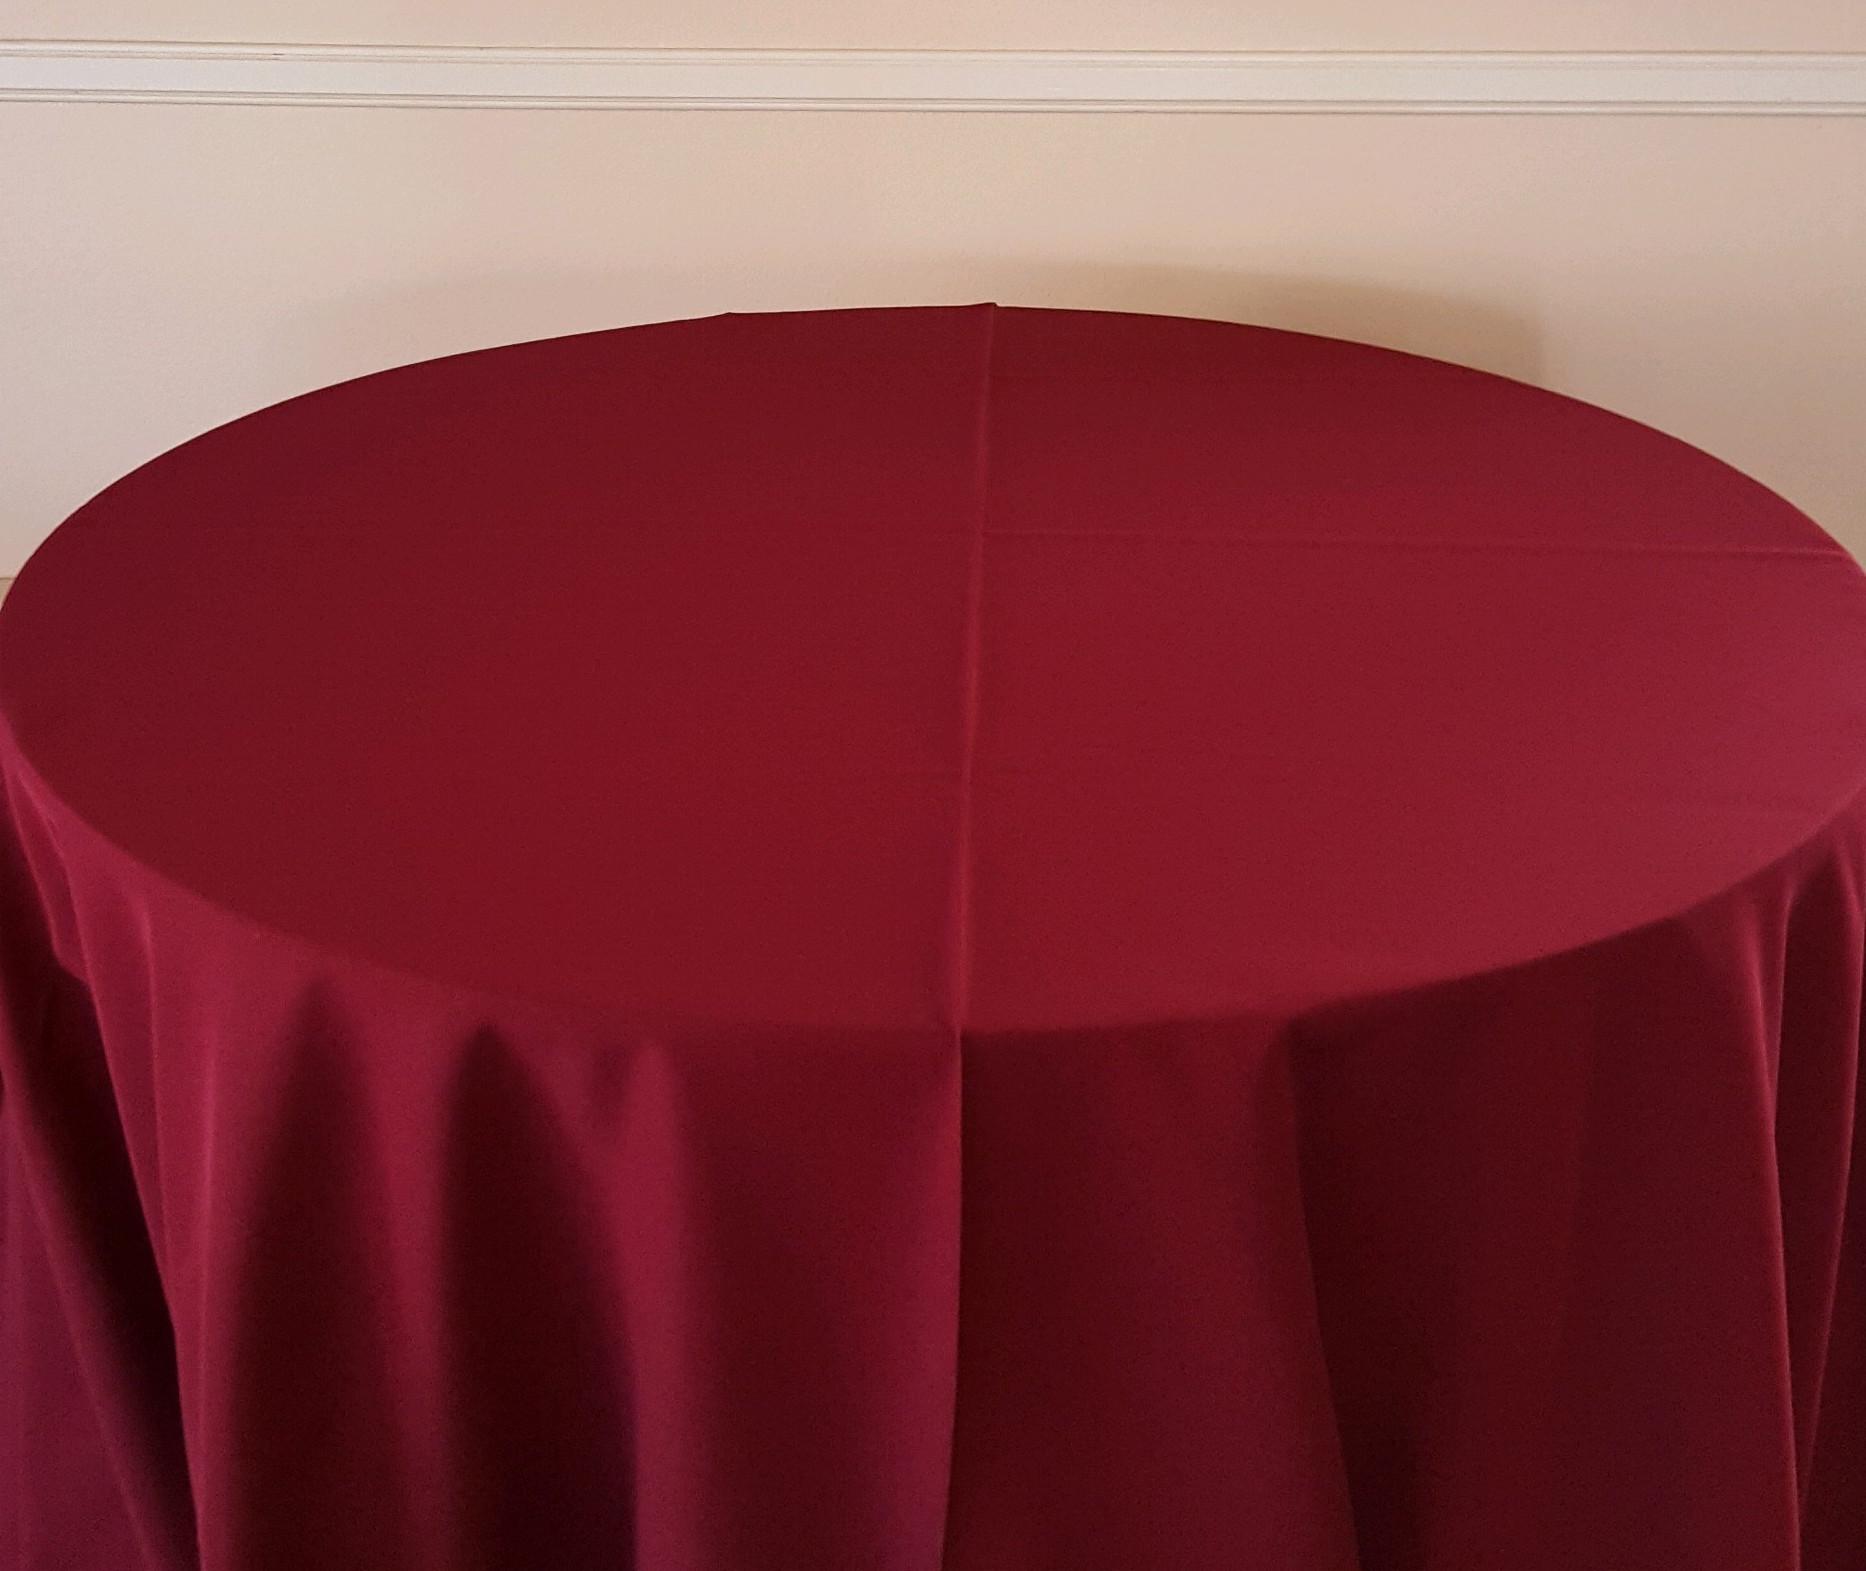 "Burgundy - 130"" drape, 120"" drape, 108"" drape, 90"" drape, 6' banquet, 8' banquet & napkins"